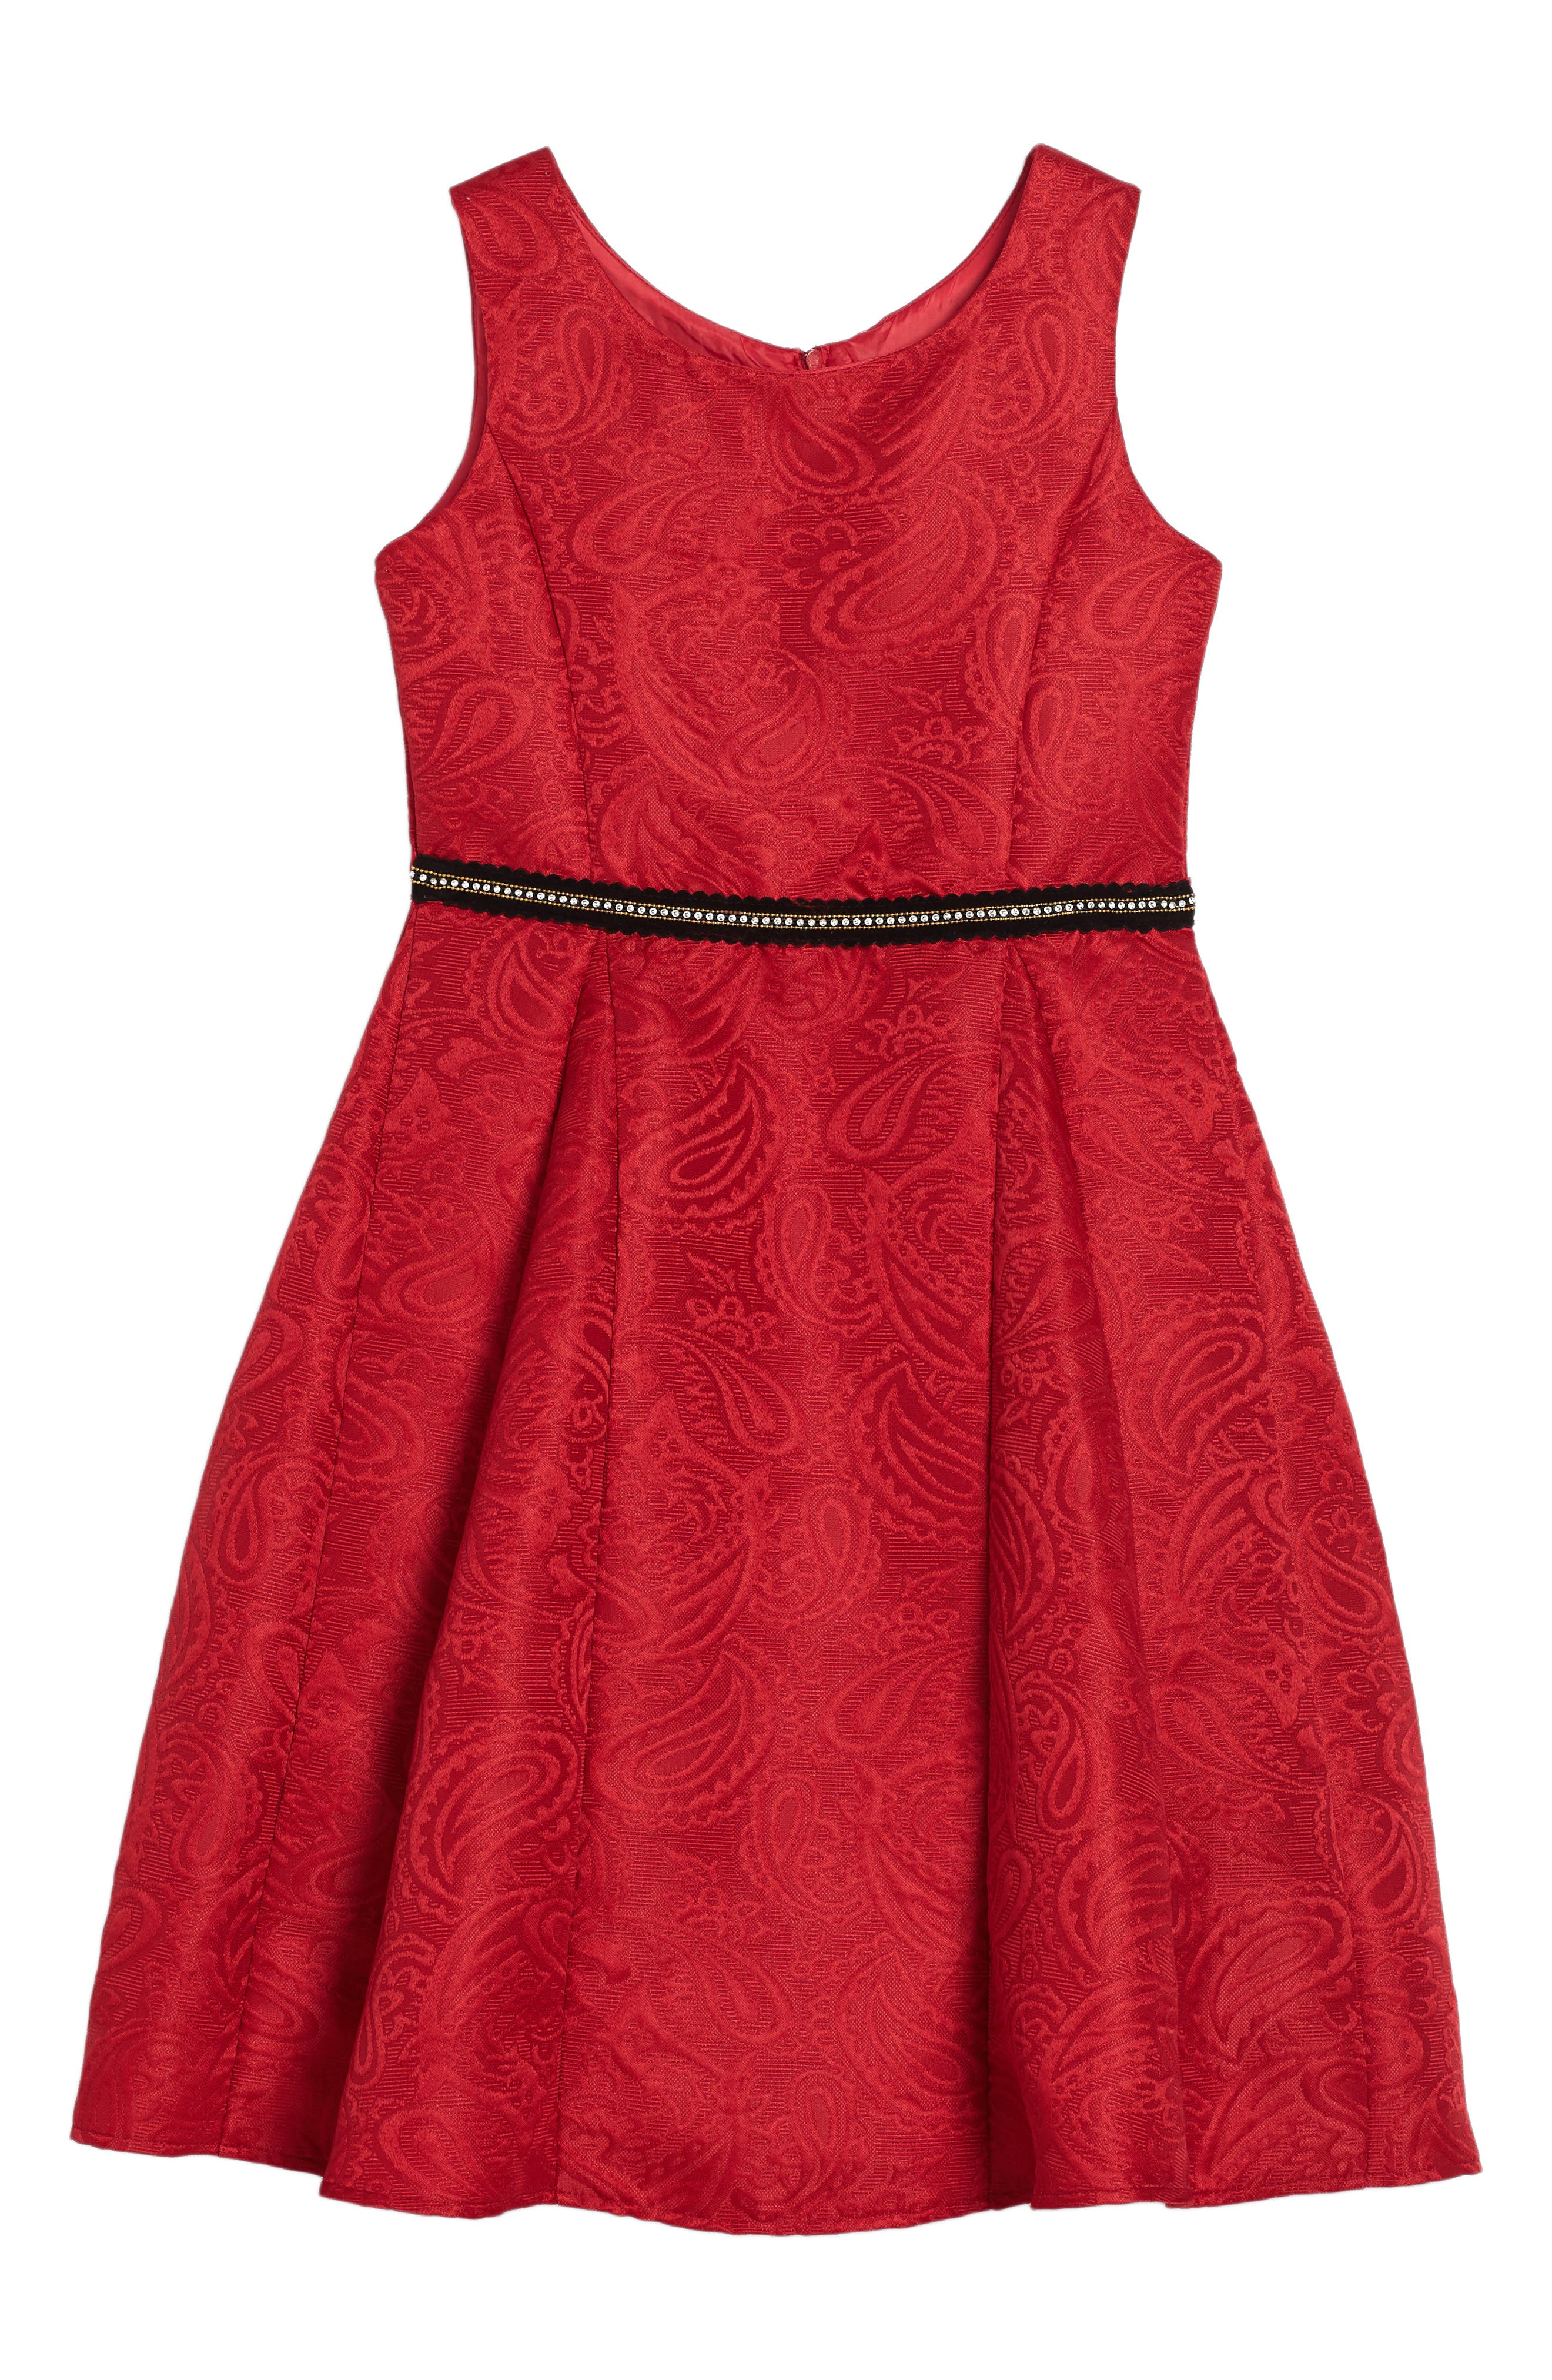 Main Image - Dorissa Hannah Jacquard Dress (Toddler Girls, Little Girls & Big Girls)